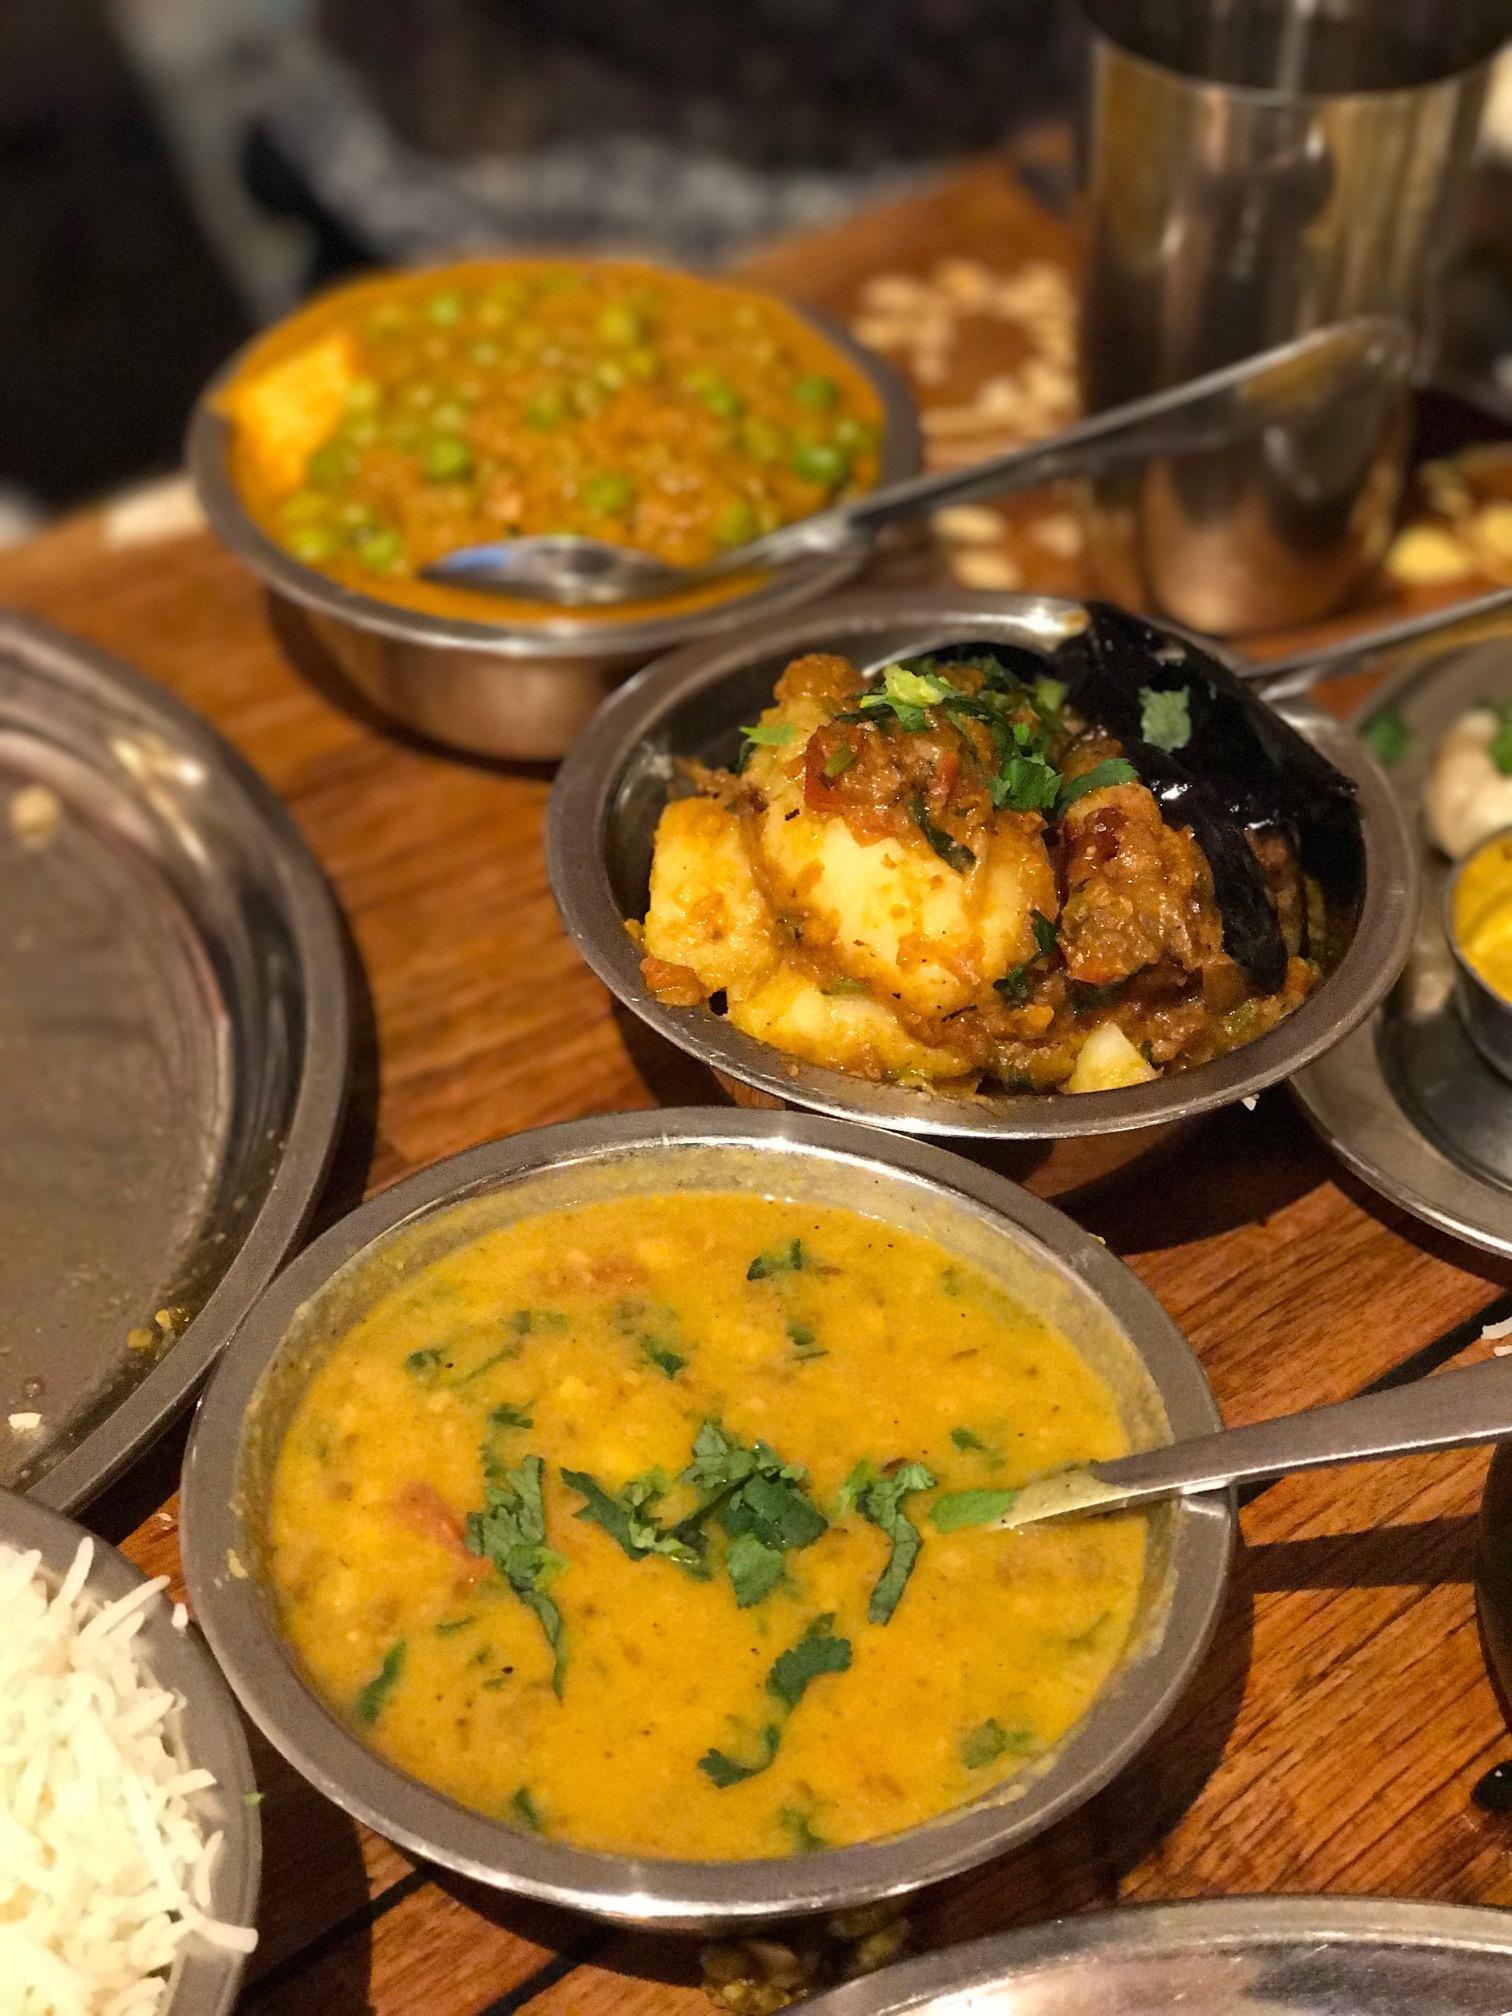 mukka_fitzroy_vegan_restaurant_food_in_melbourne.jpg